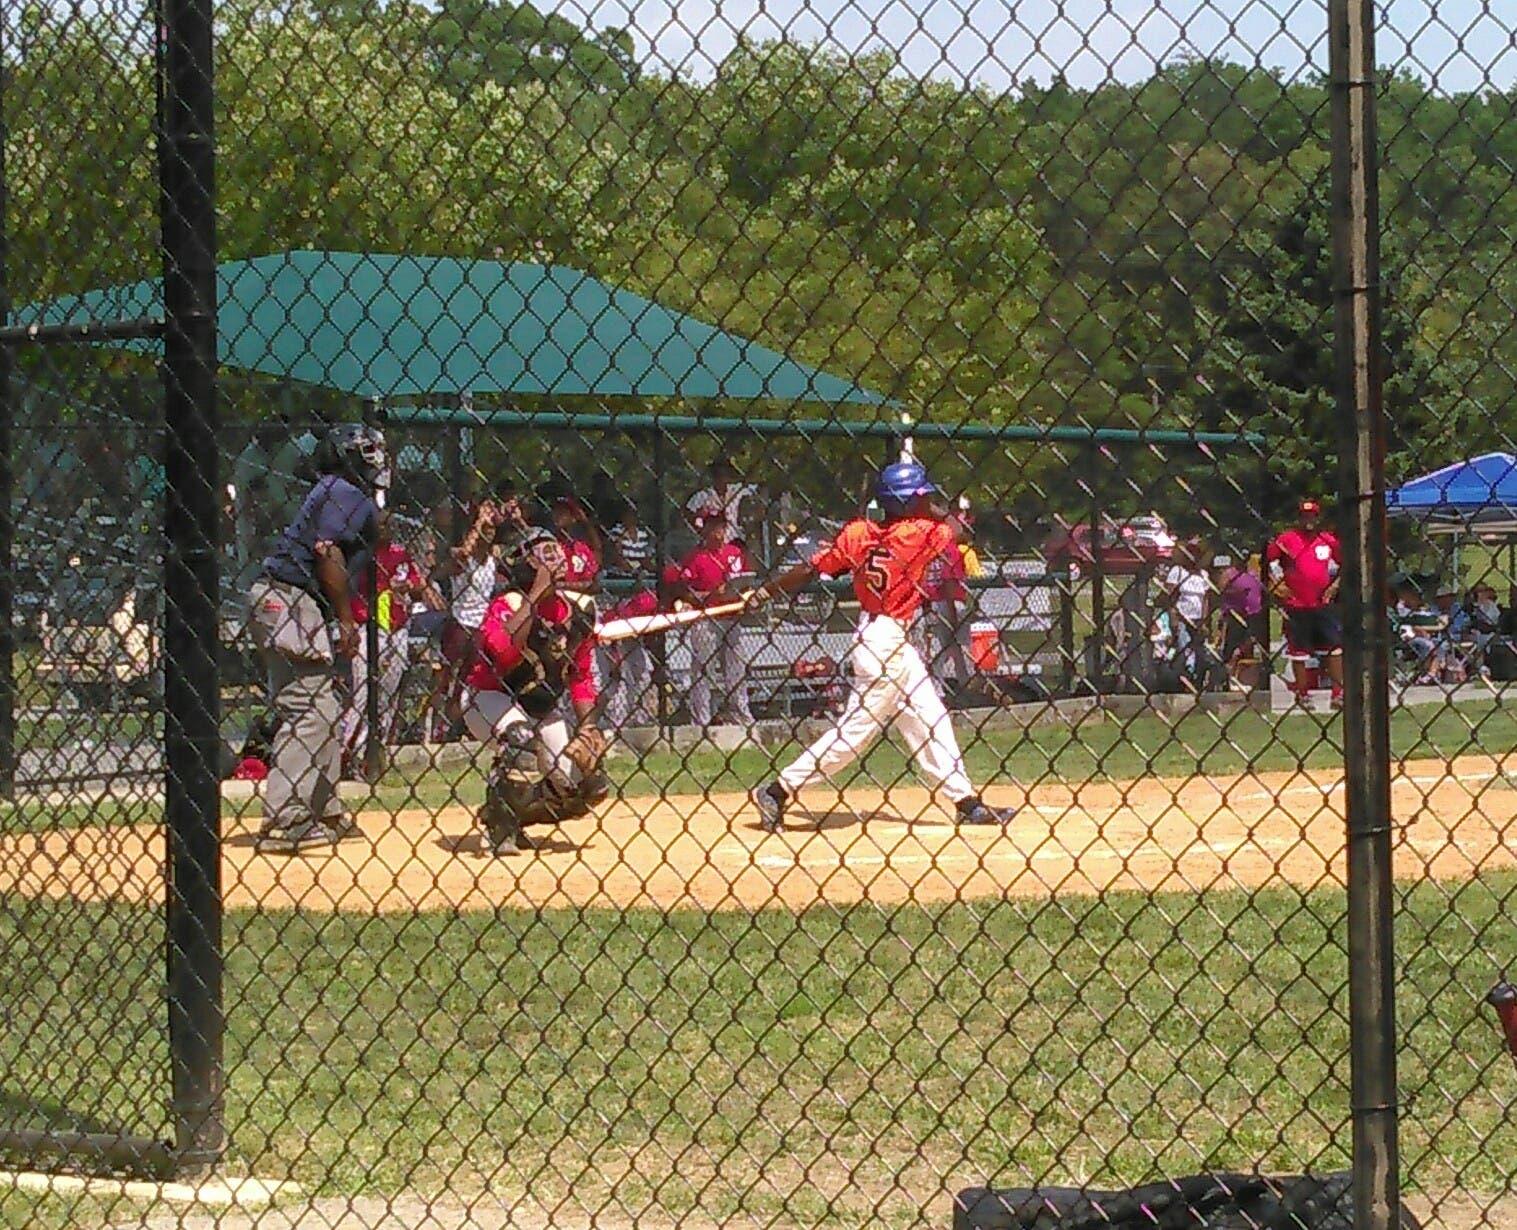 Hamilton Baseball Registration Open For 2016 Parkville Md Patch